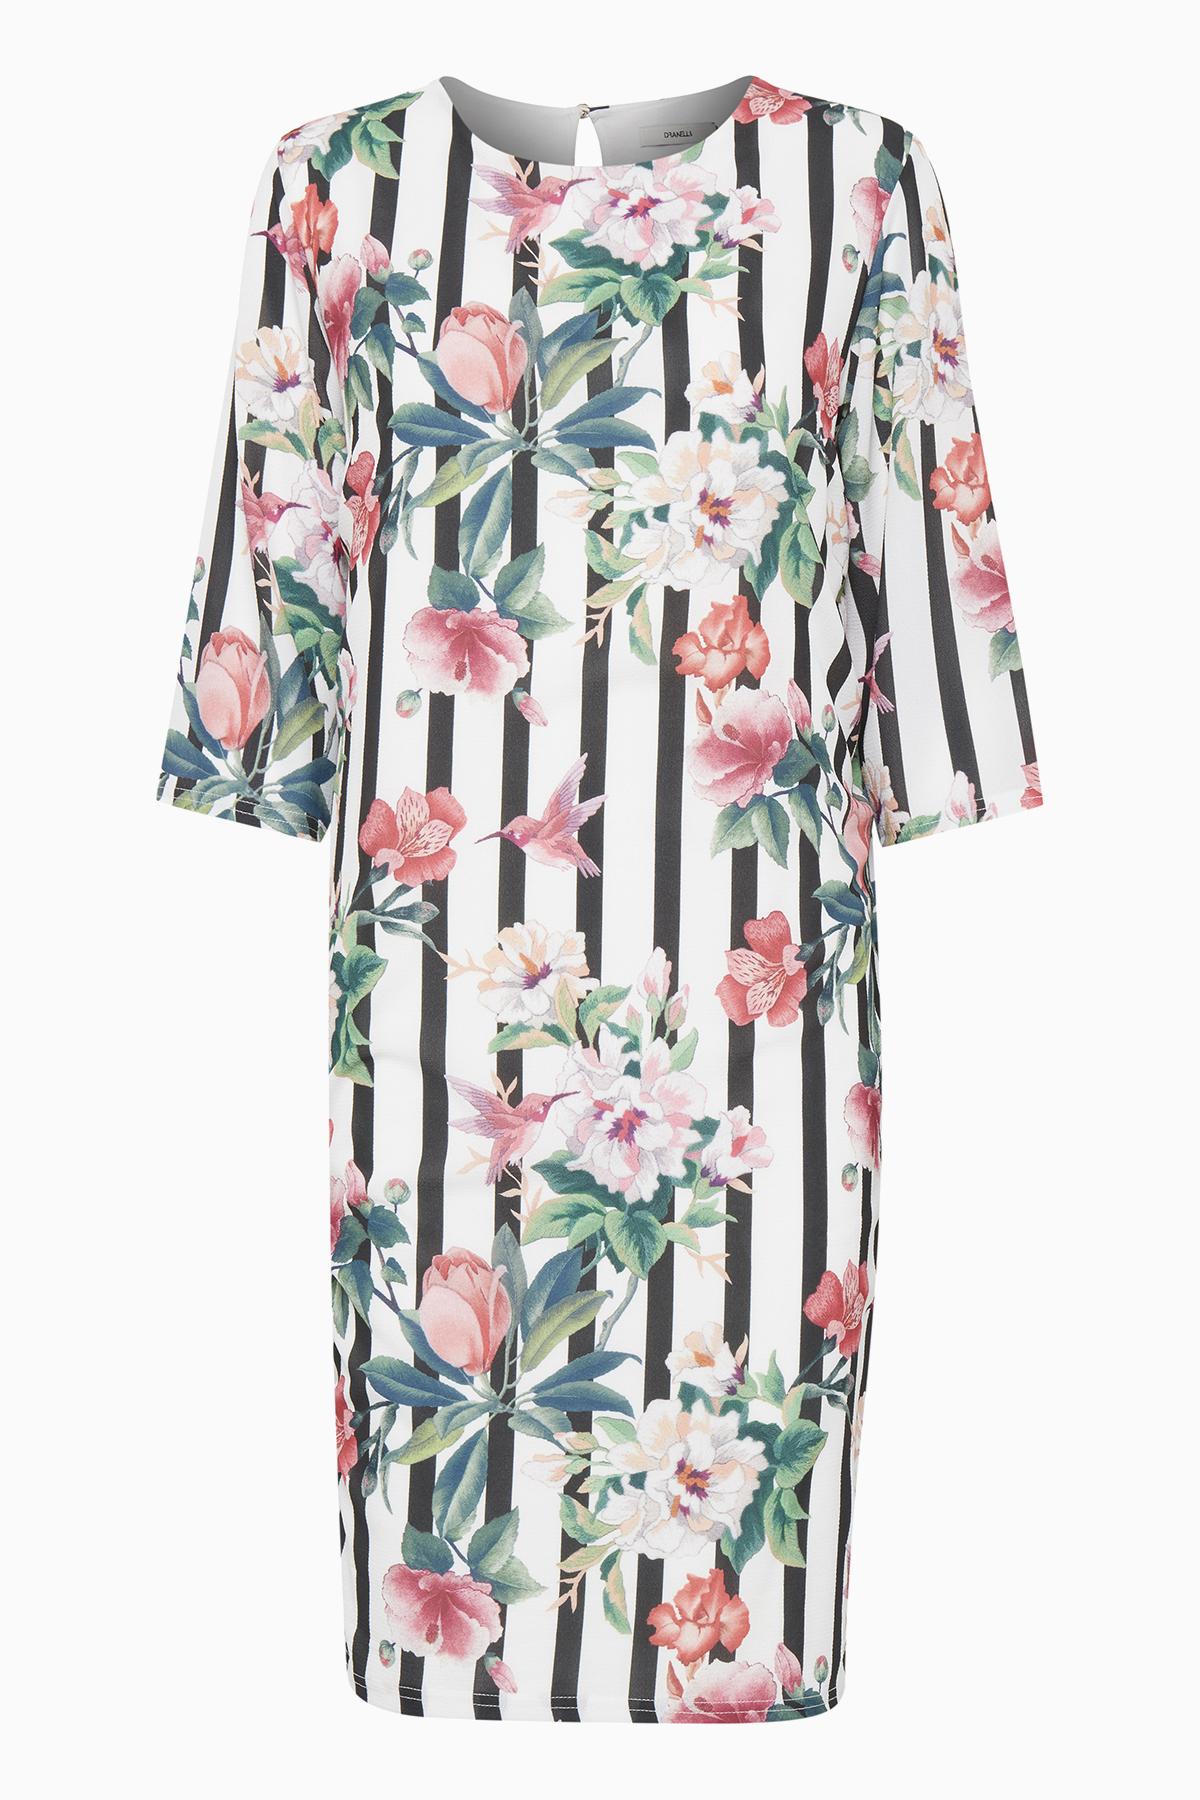 Dranella Dame 3/4 ærmet kjole - Hvid/rosa